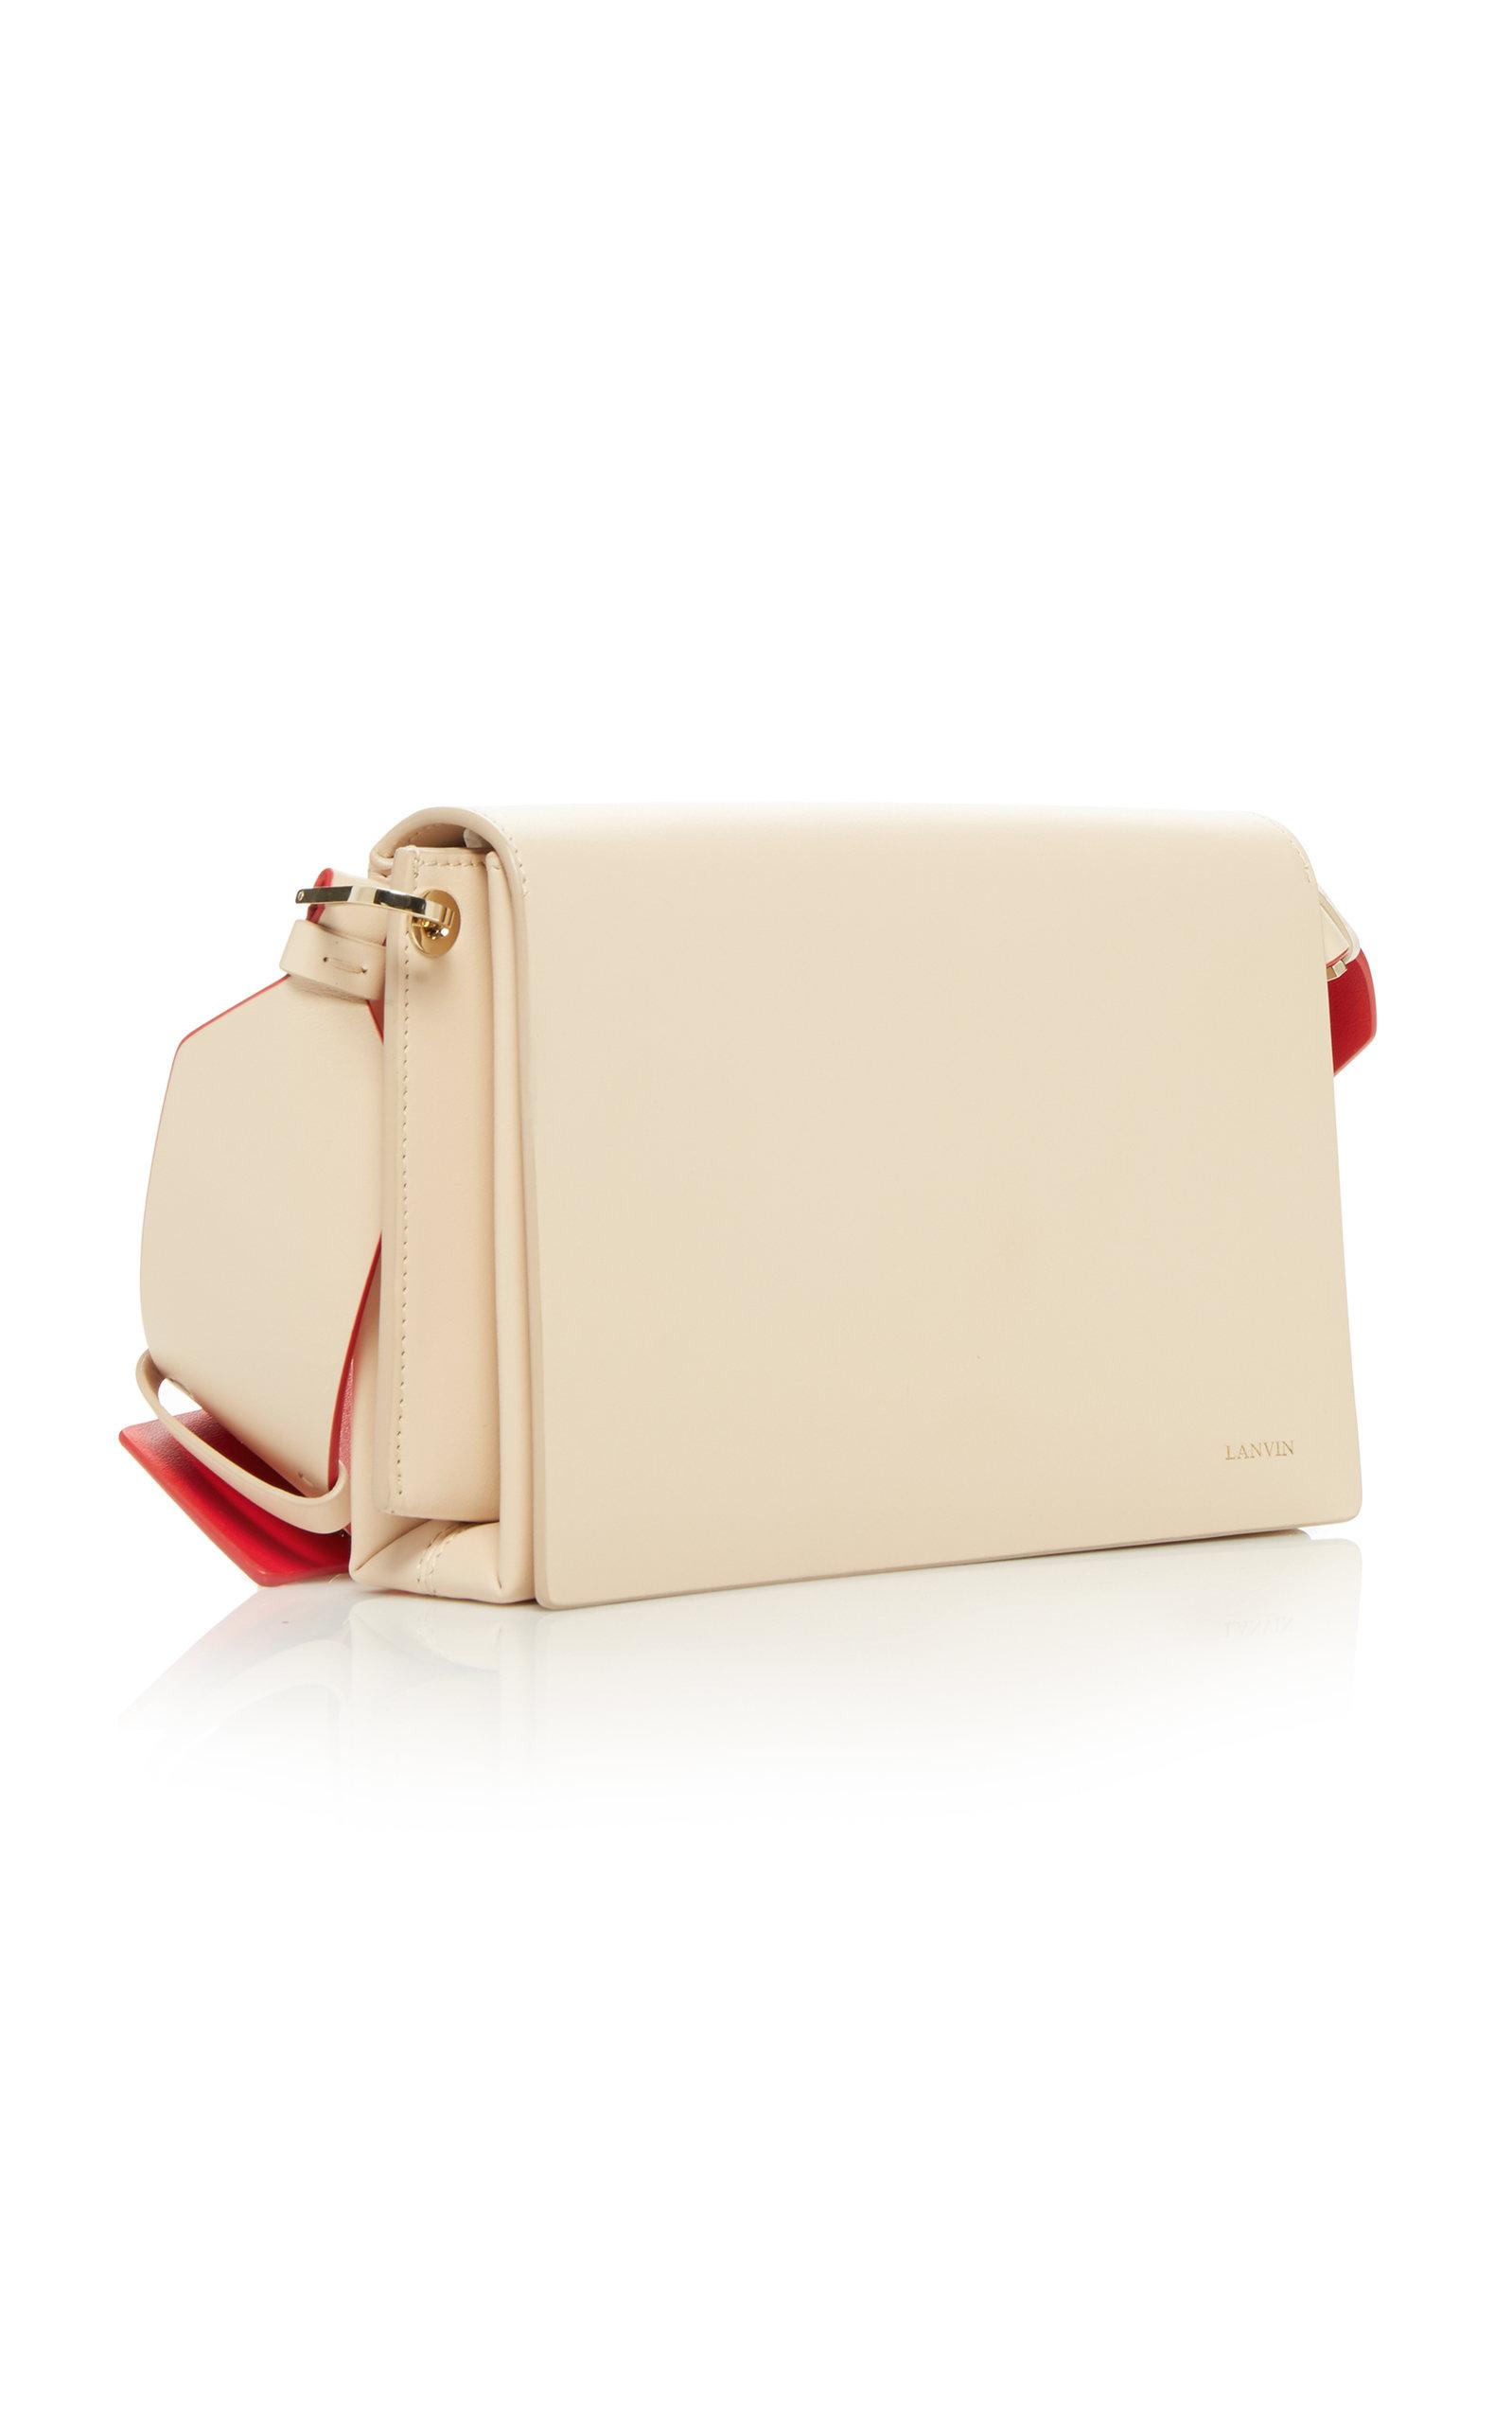 c4f7d6f381c Pixel-It Bag with Pouch by Lanvin | Moda Operandi